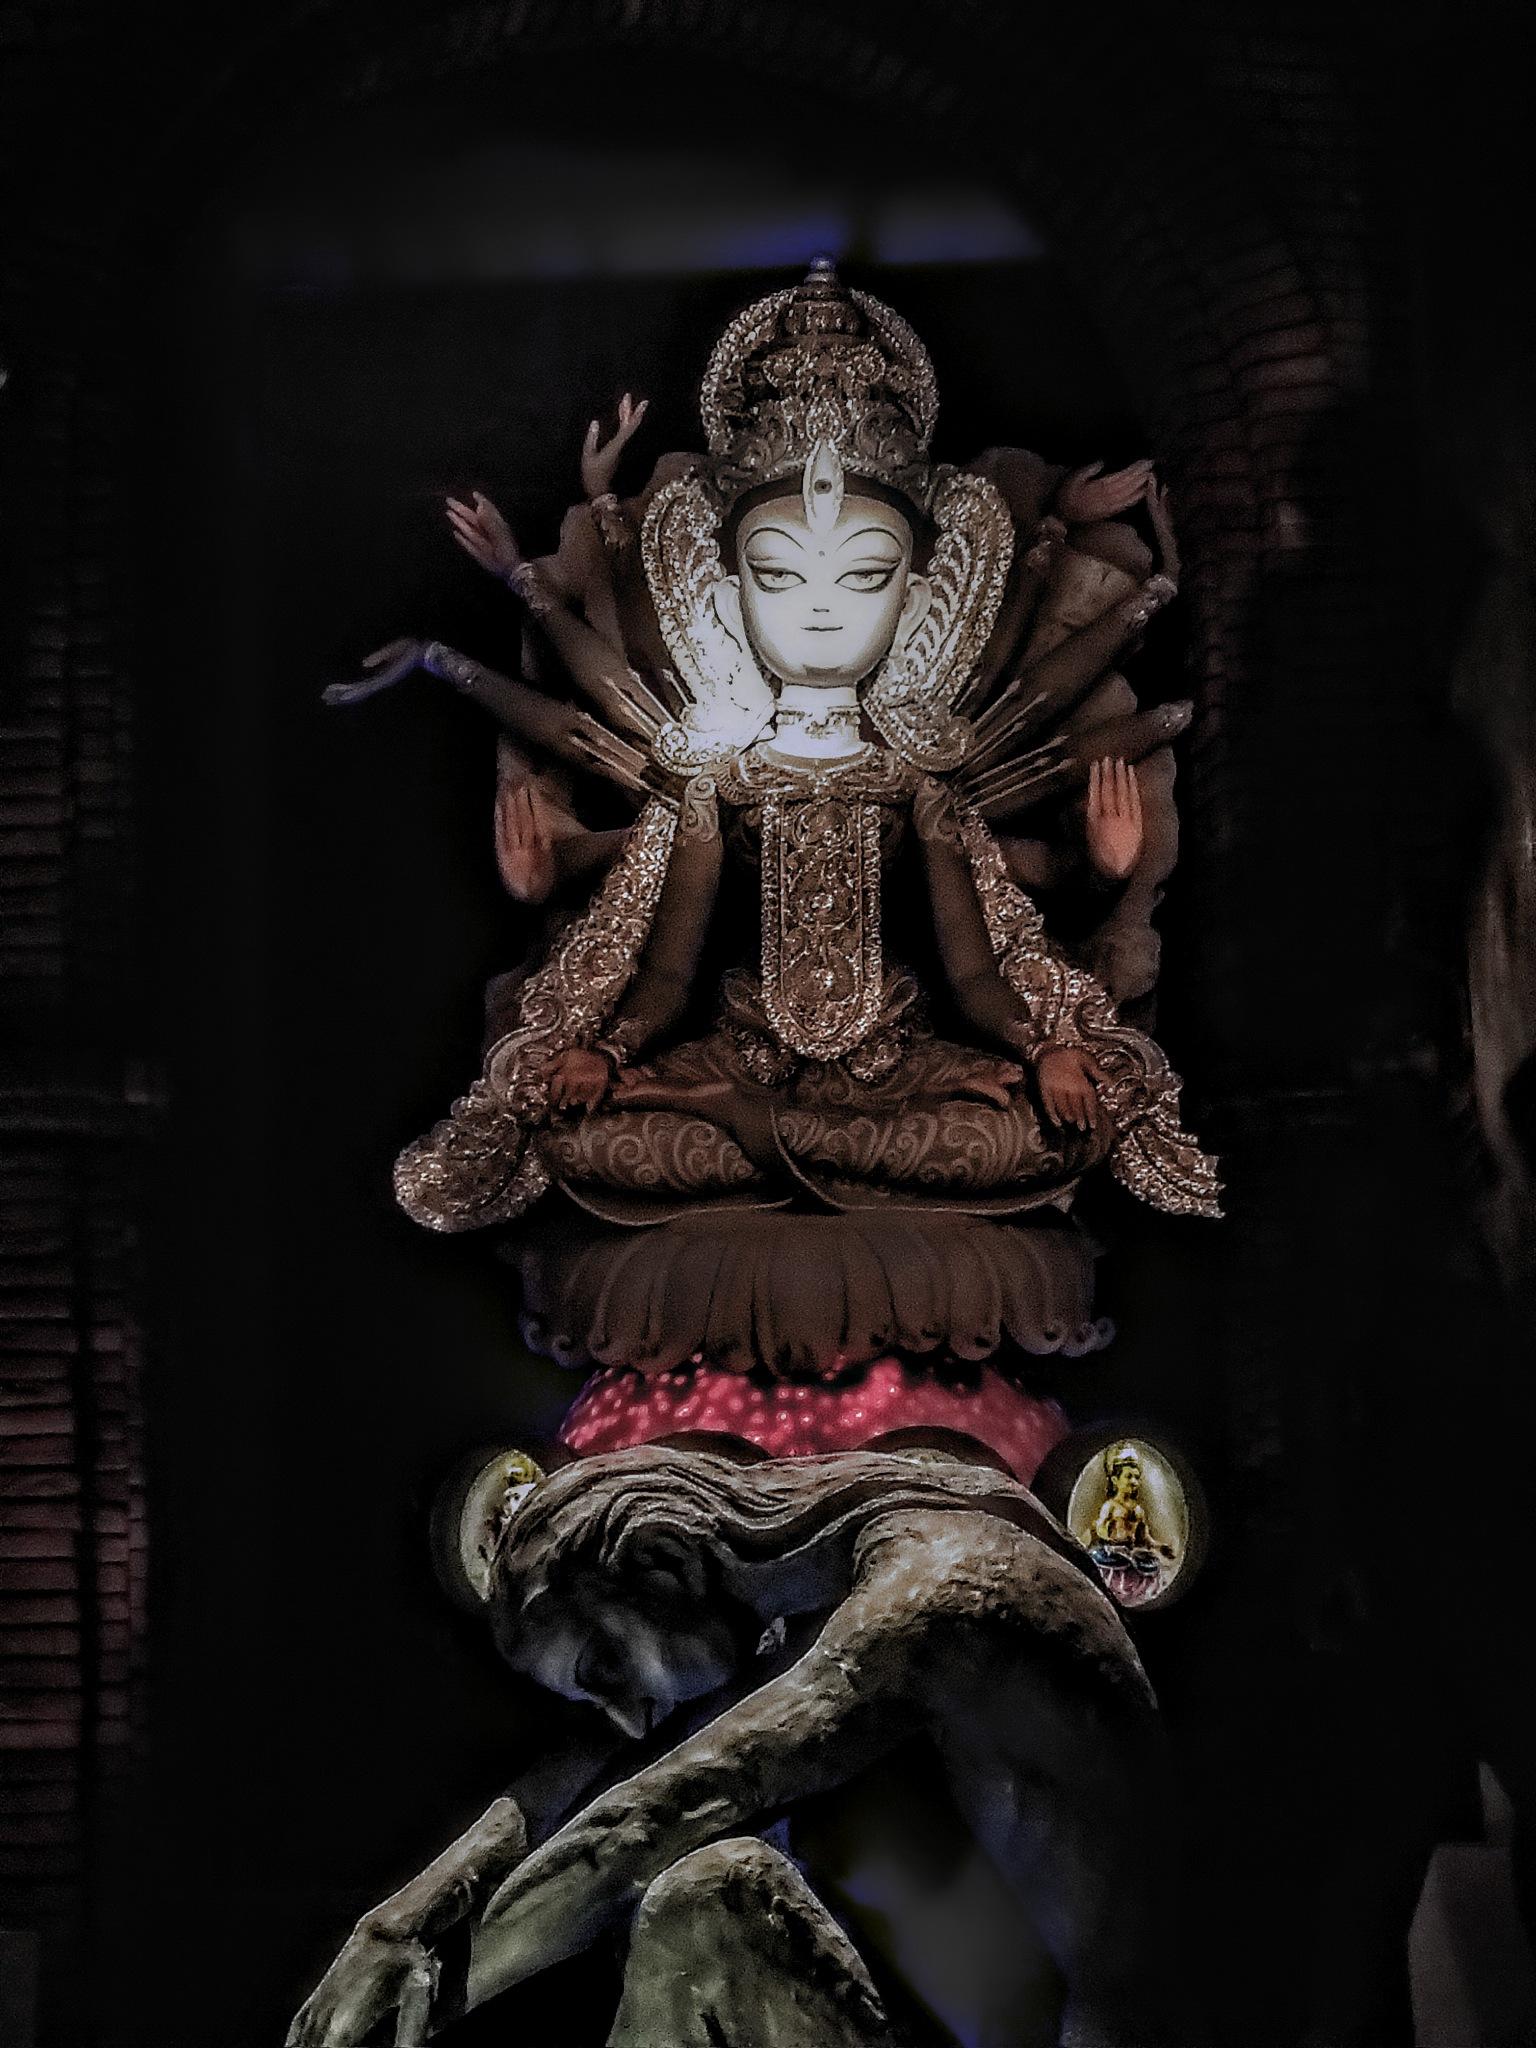 Maa Durga by Simran Kewalramani